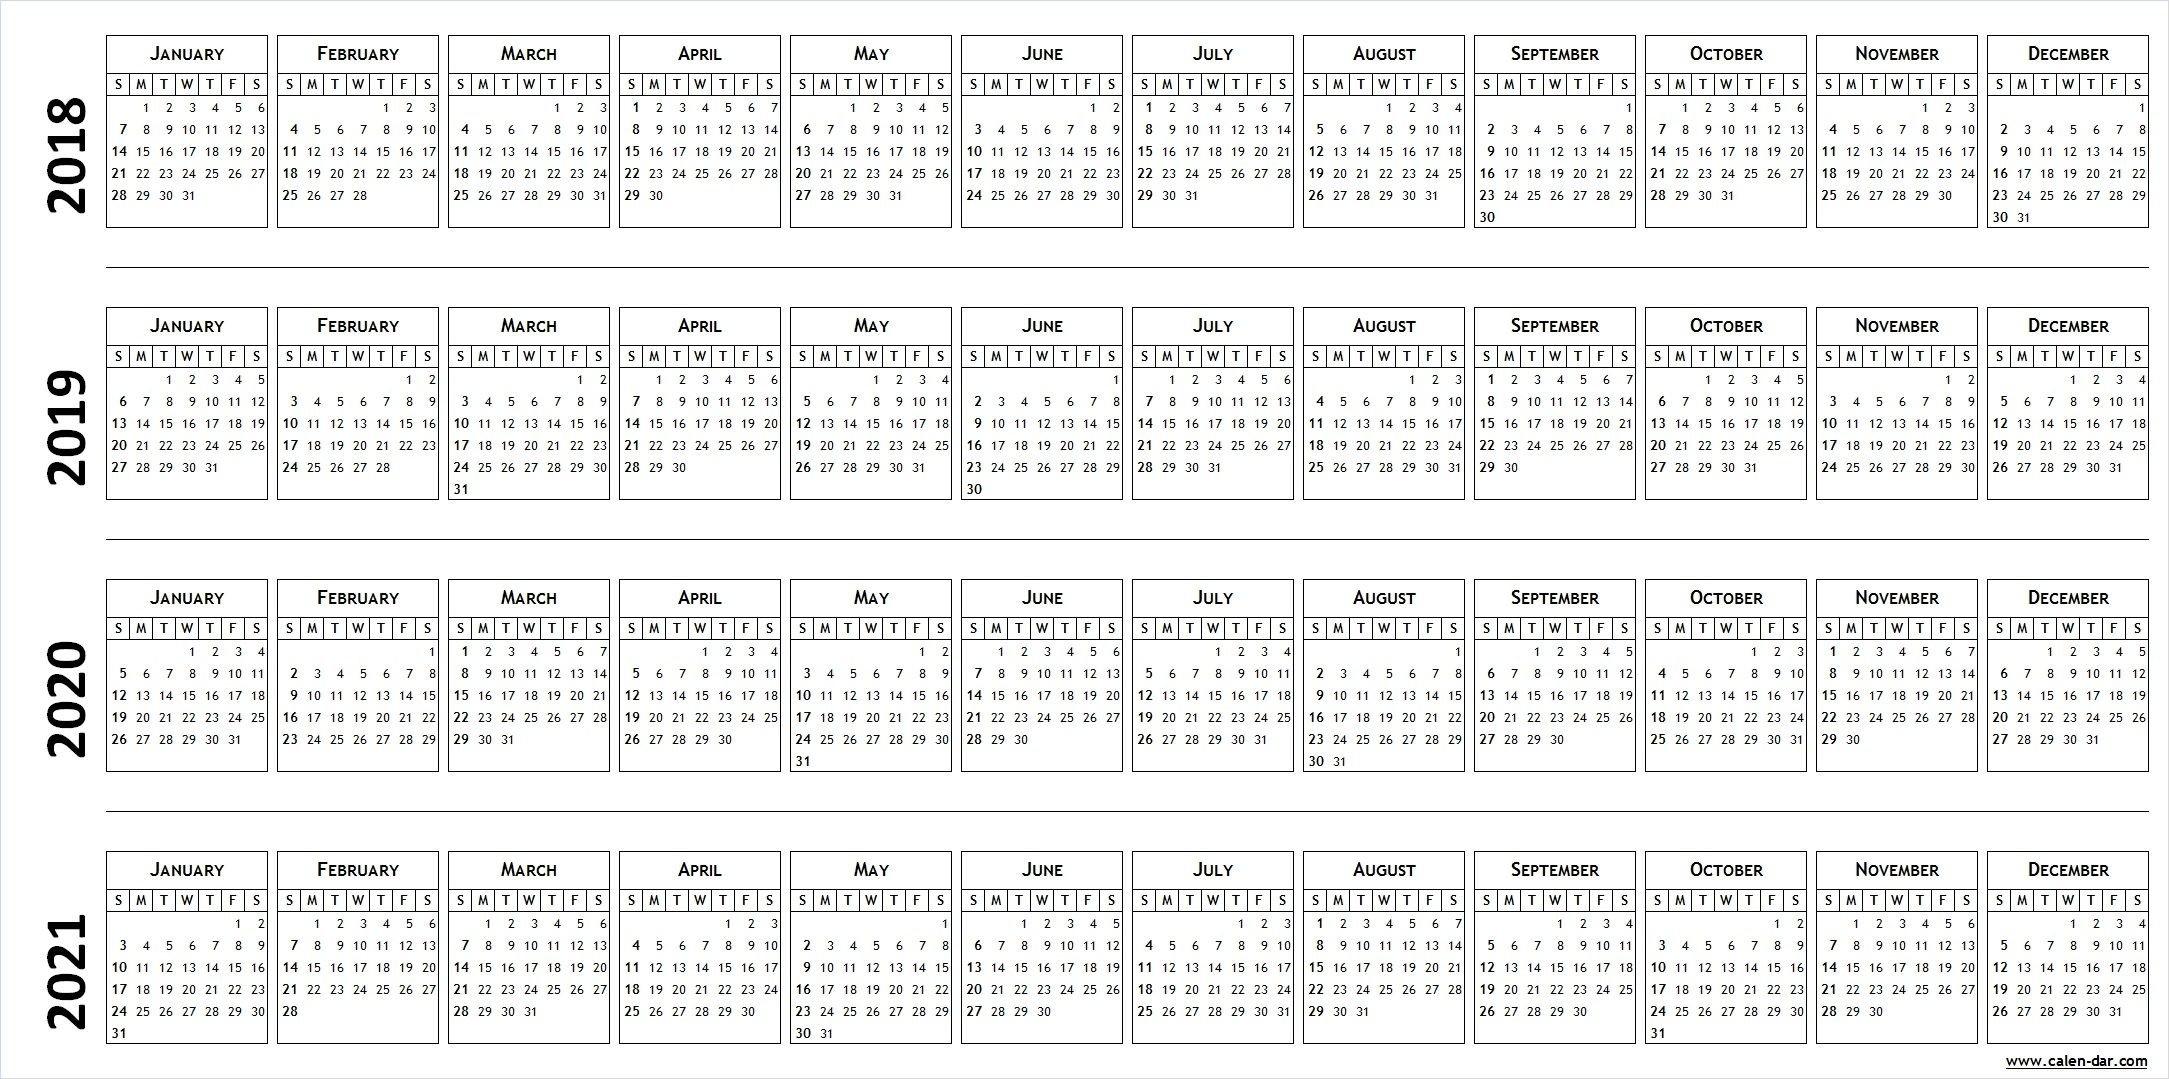 4 Four Year Blank Calendar 2018 2019 2020 2021 | Calendar 4 Year Calendar 2019 To 2022 Printable